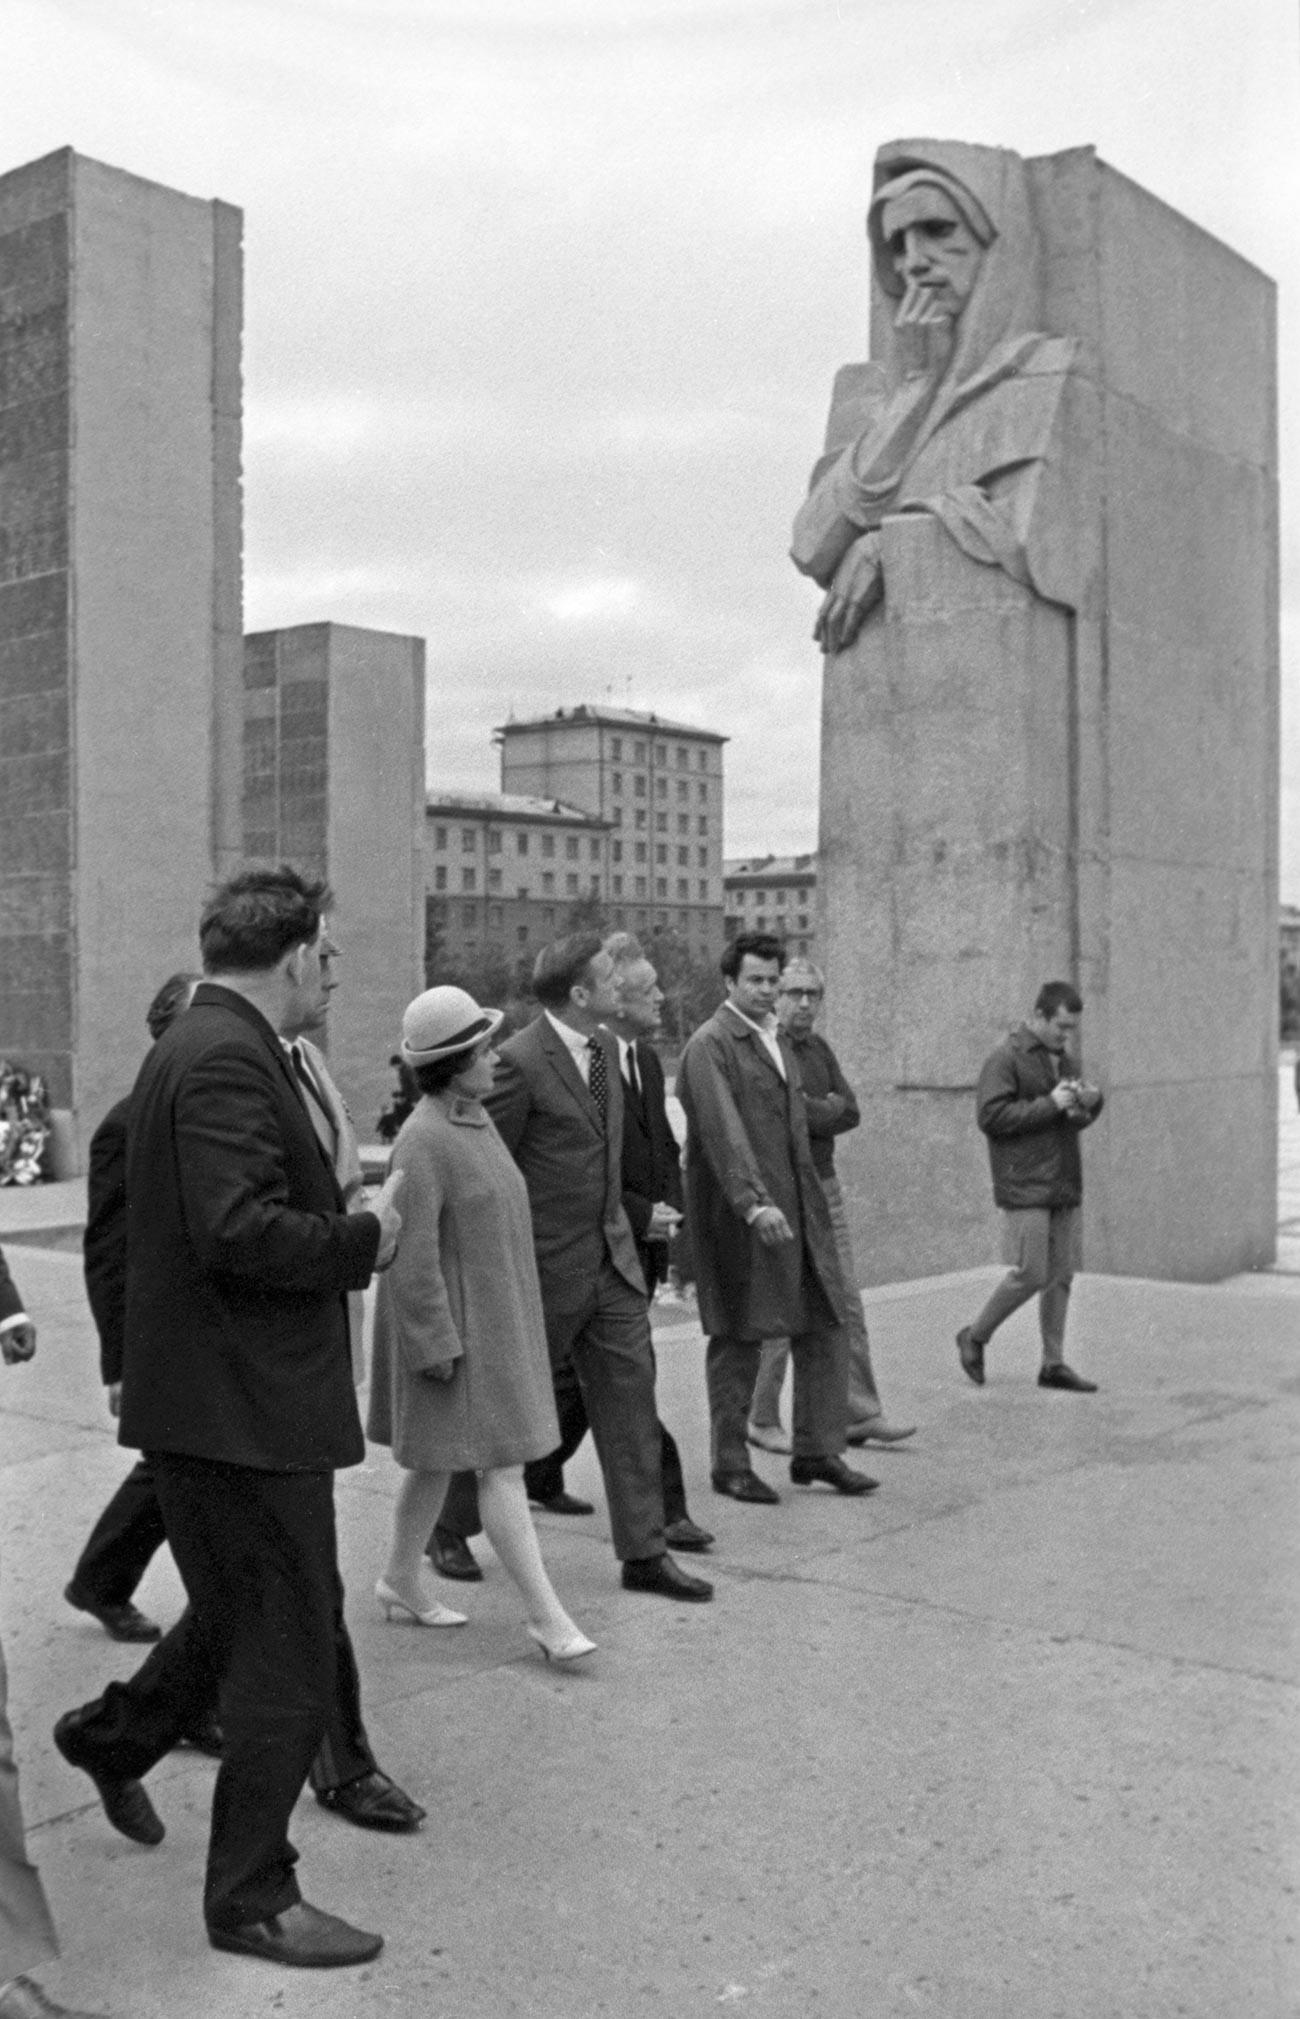 Armstrong mengunjungi kompleks peringatan Monumen Kejayaan di Novosibirsk.